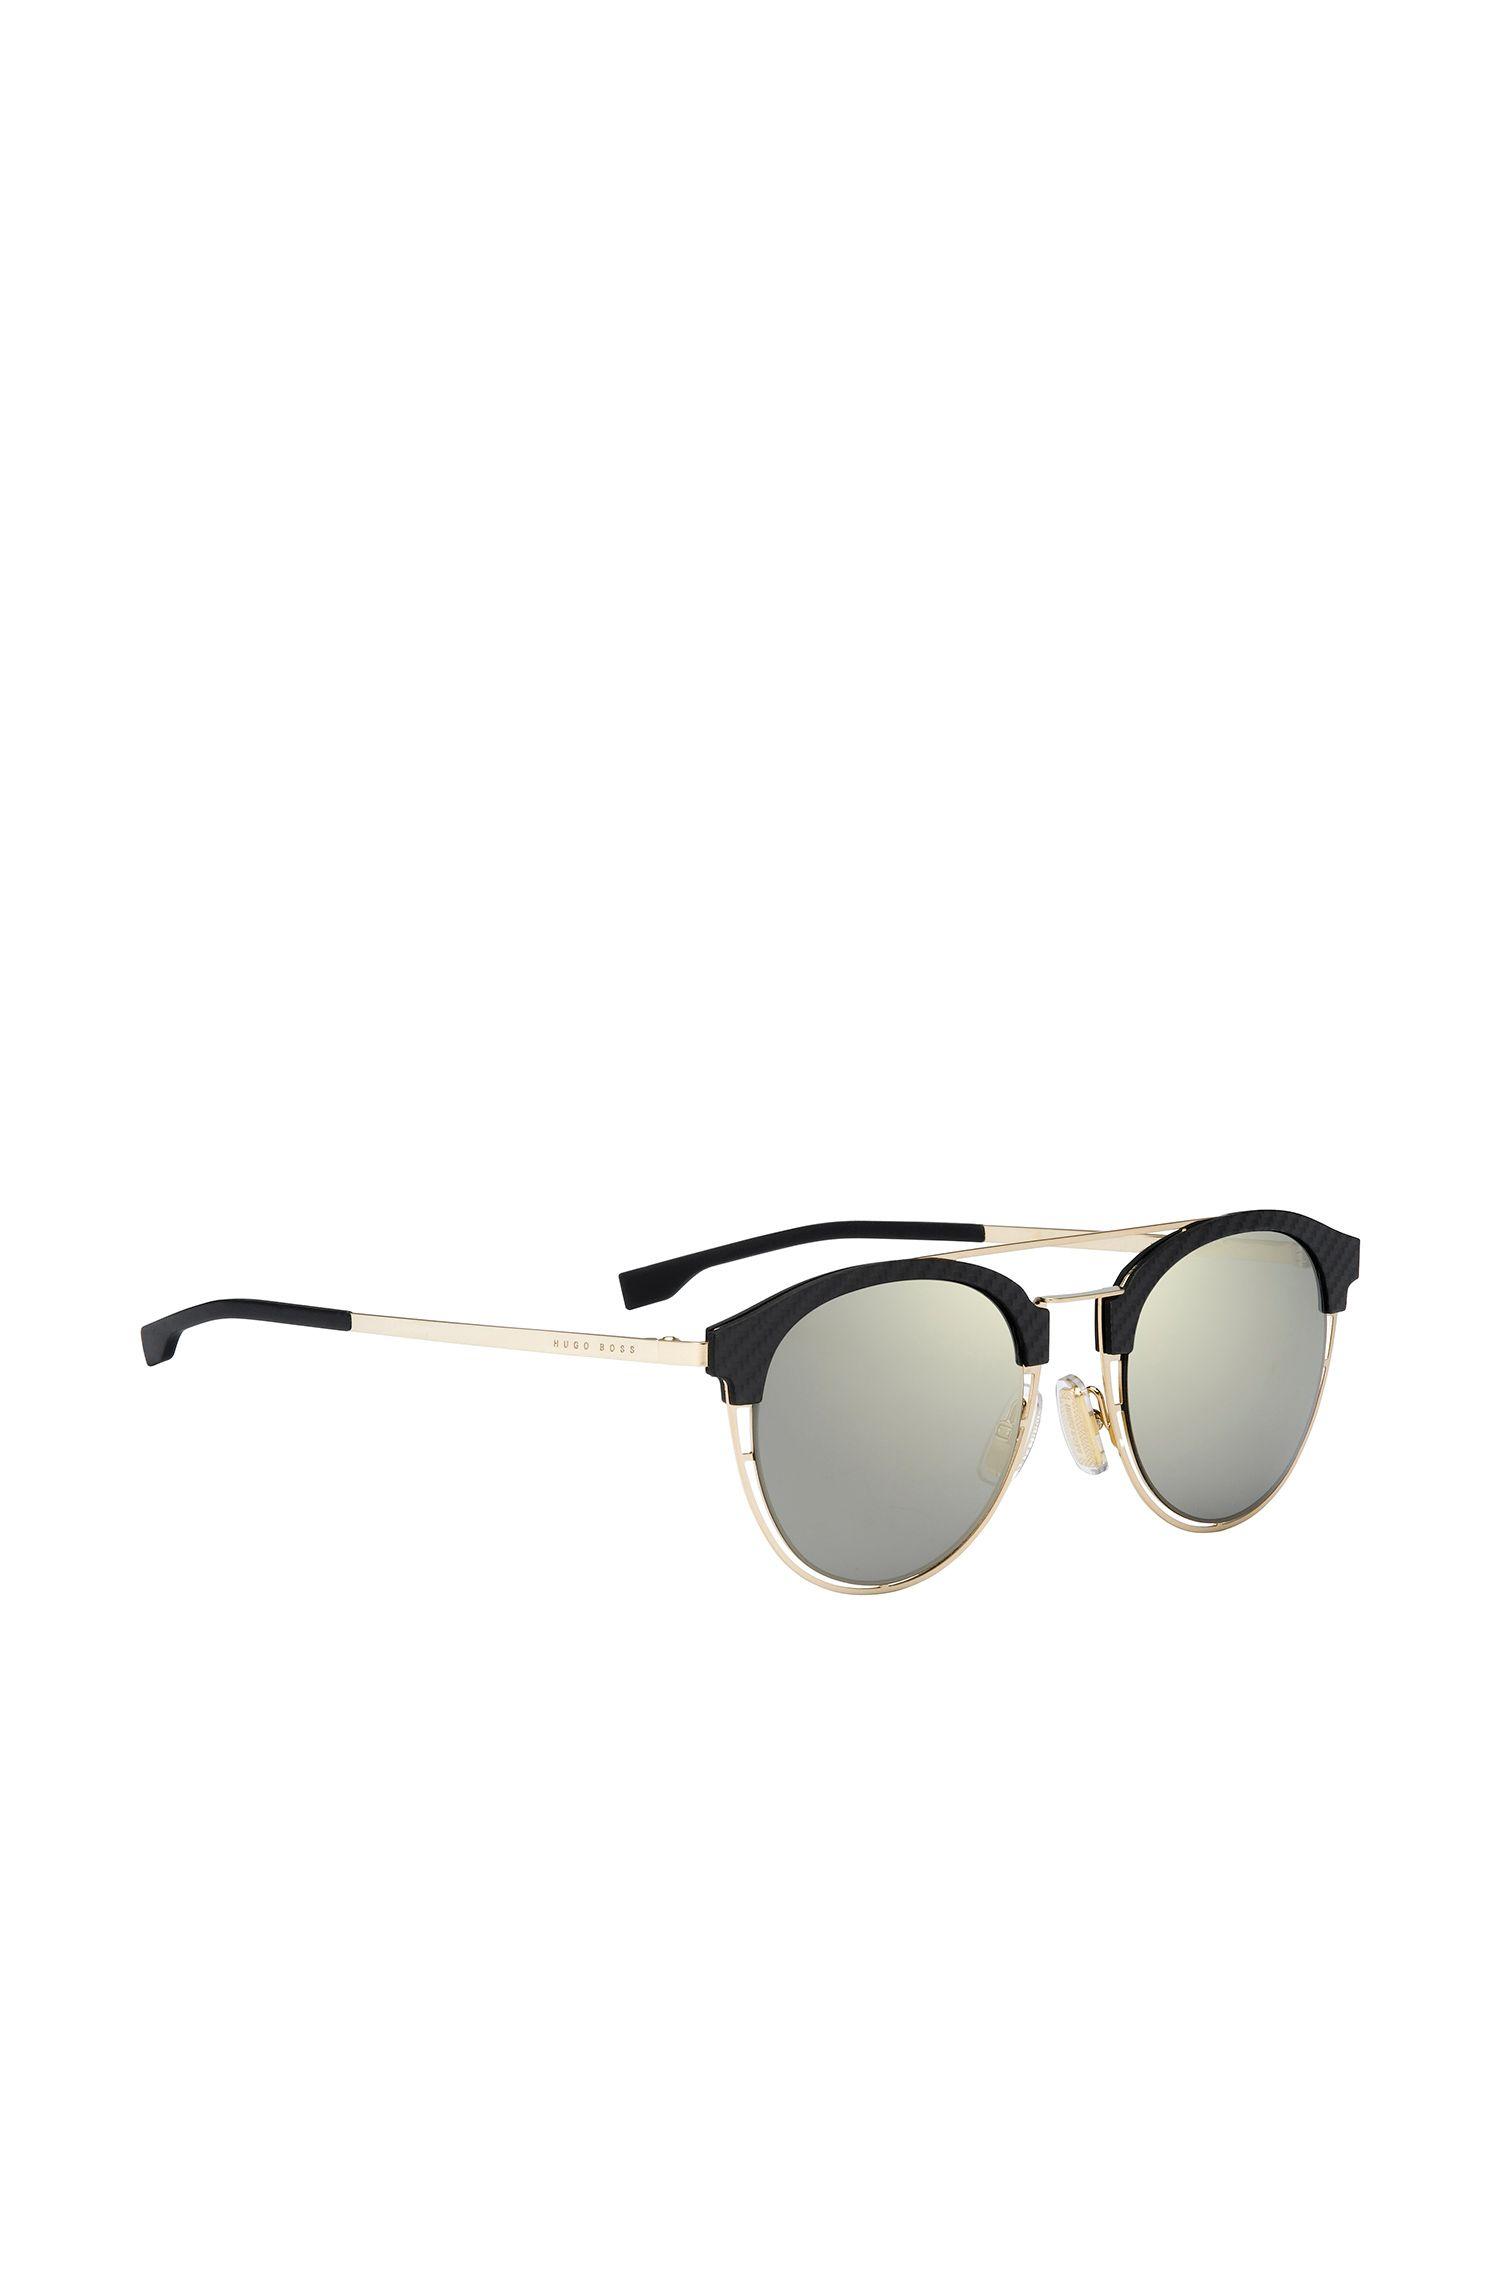 'BOSS 0784S' | Grey Bronze Lens Clubmaster Sunglasses